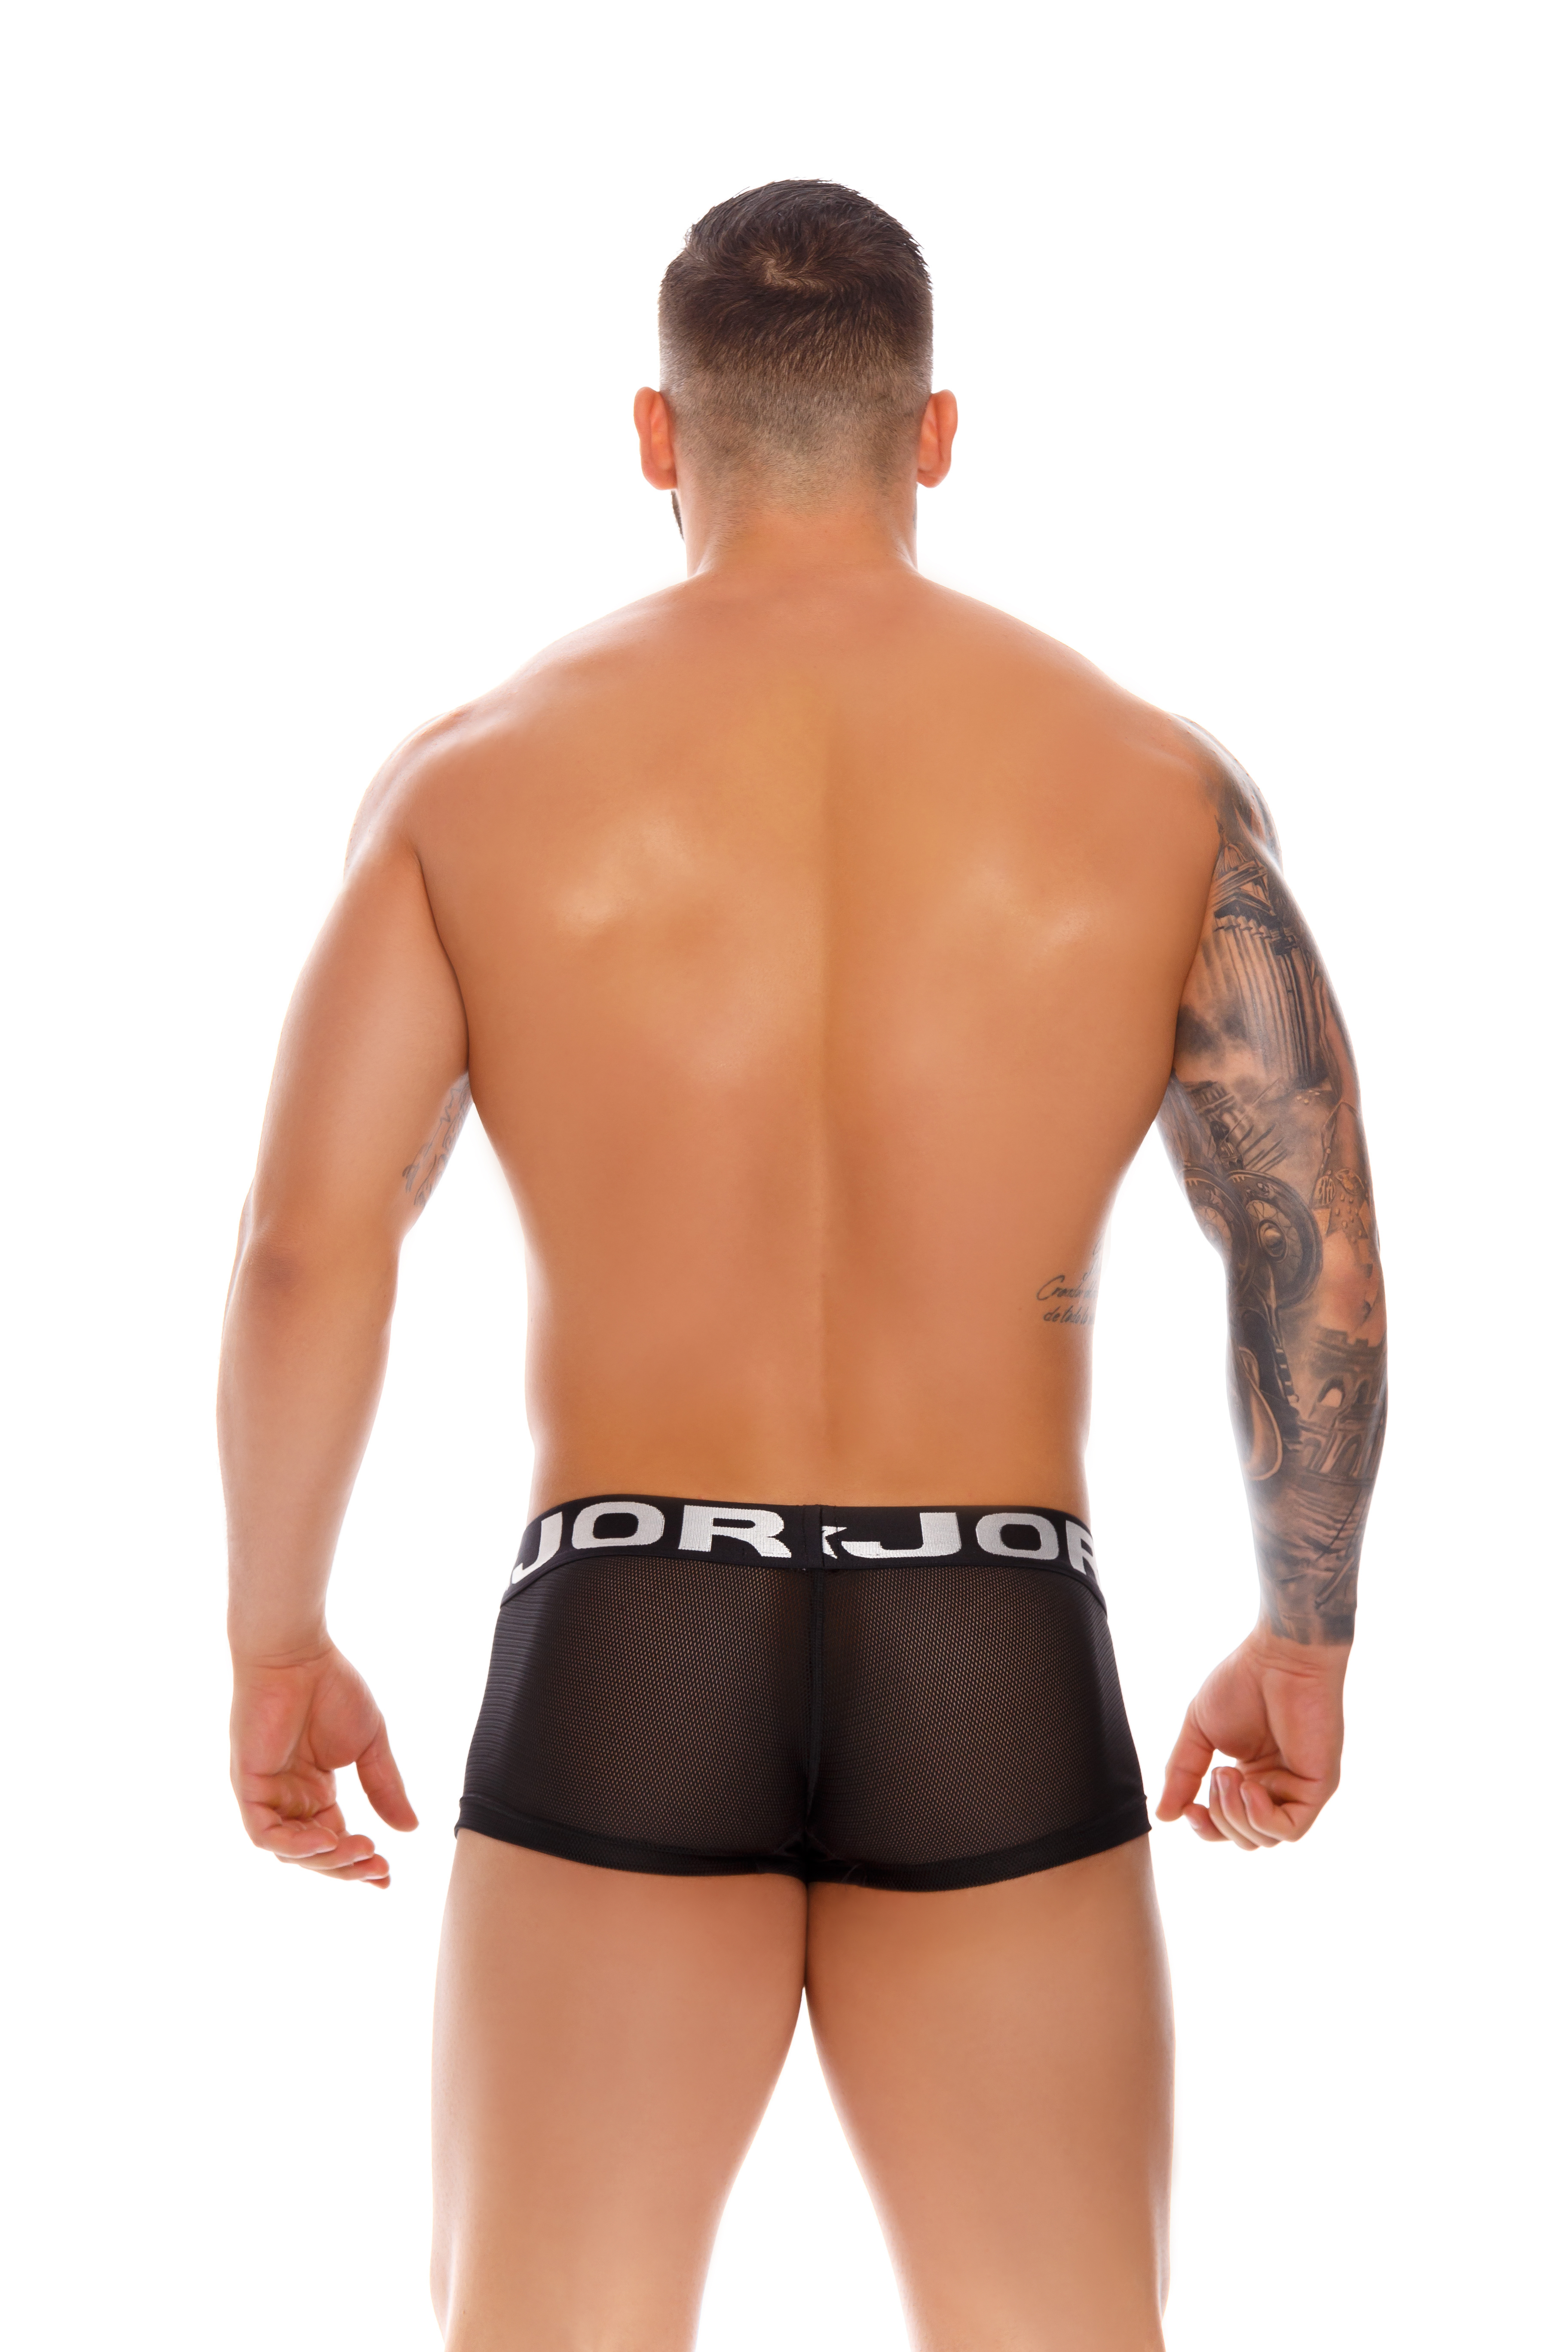 JOR Boxer Mediterraneo   Black